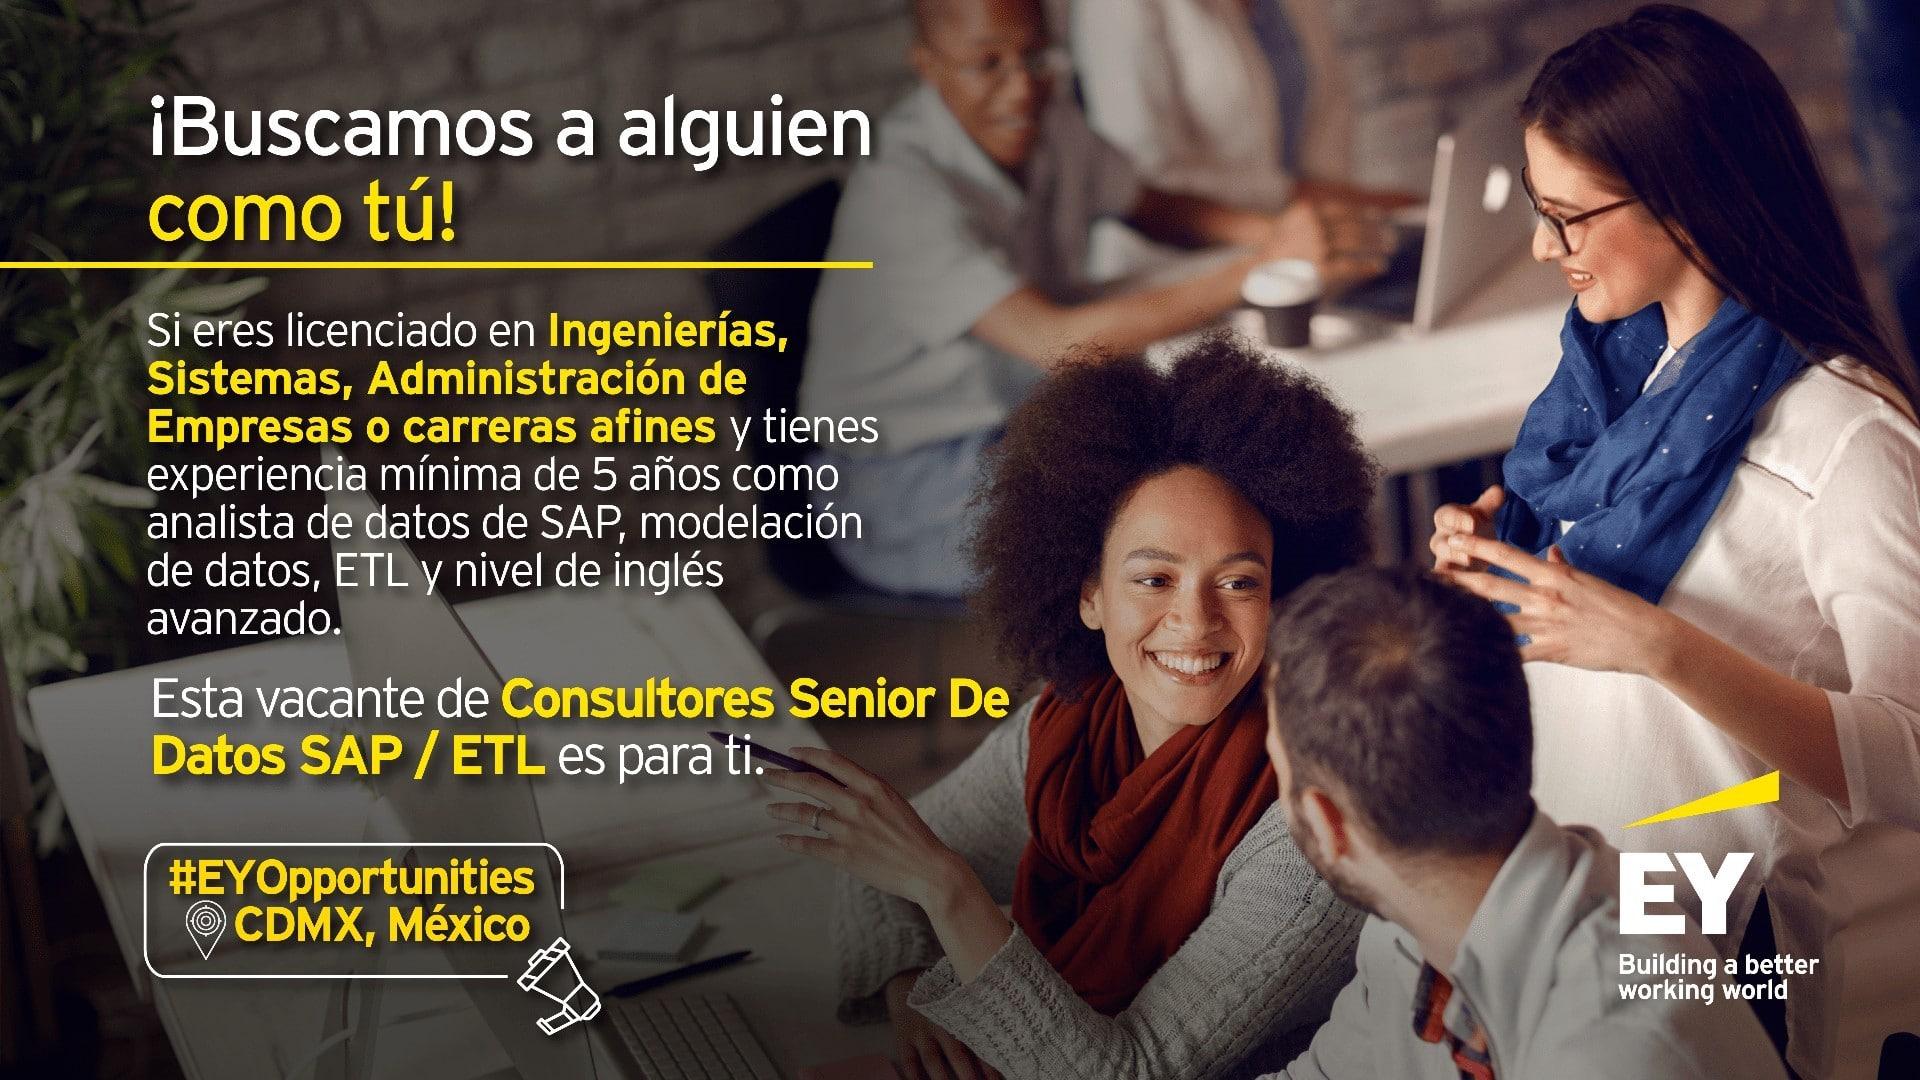 Consultor Senior de Datos SAP / ETL